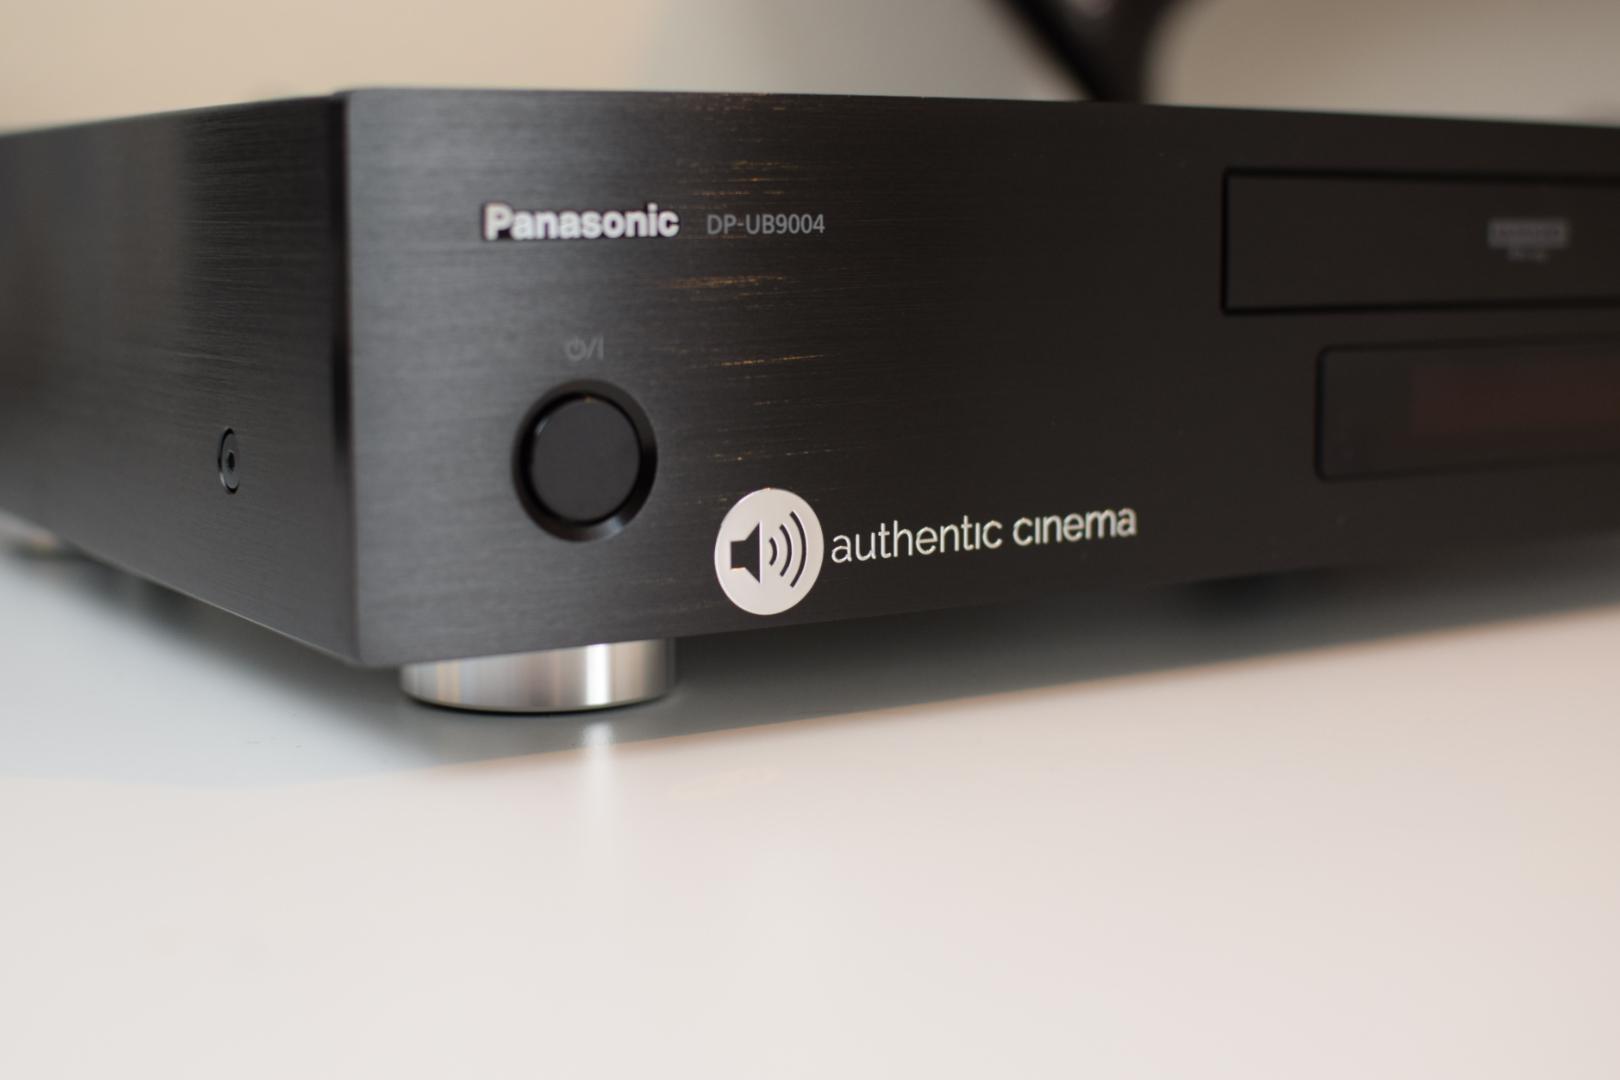 Panasonic DP-UB9004 9000 authentic cinema